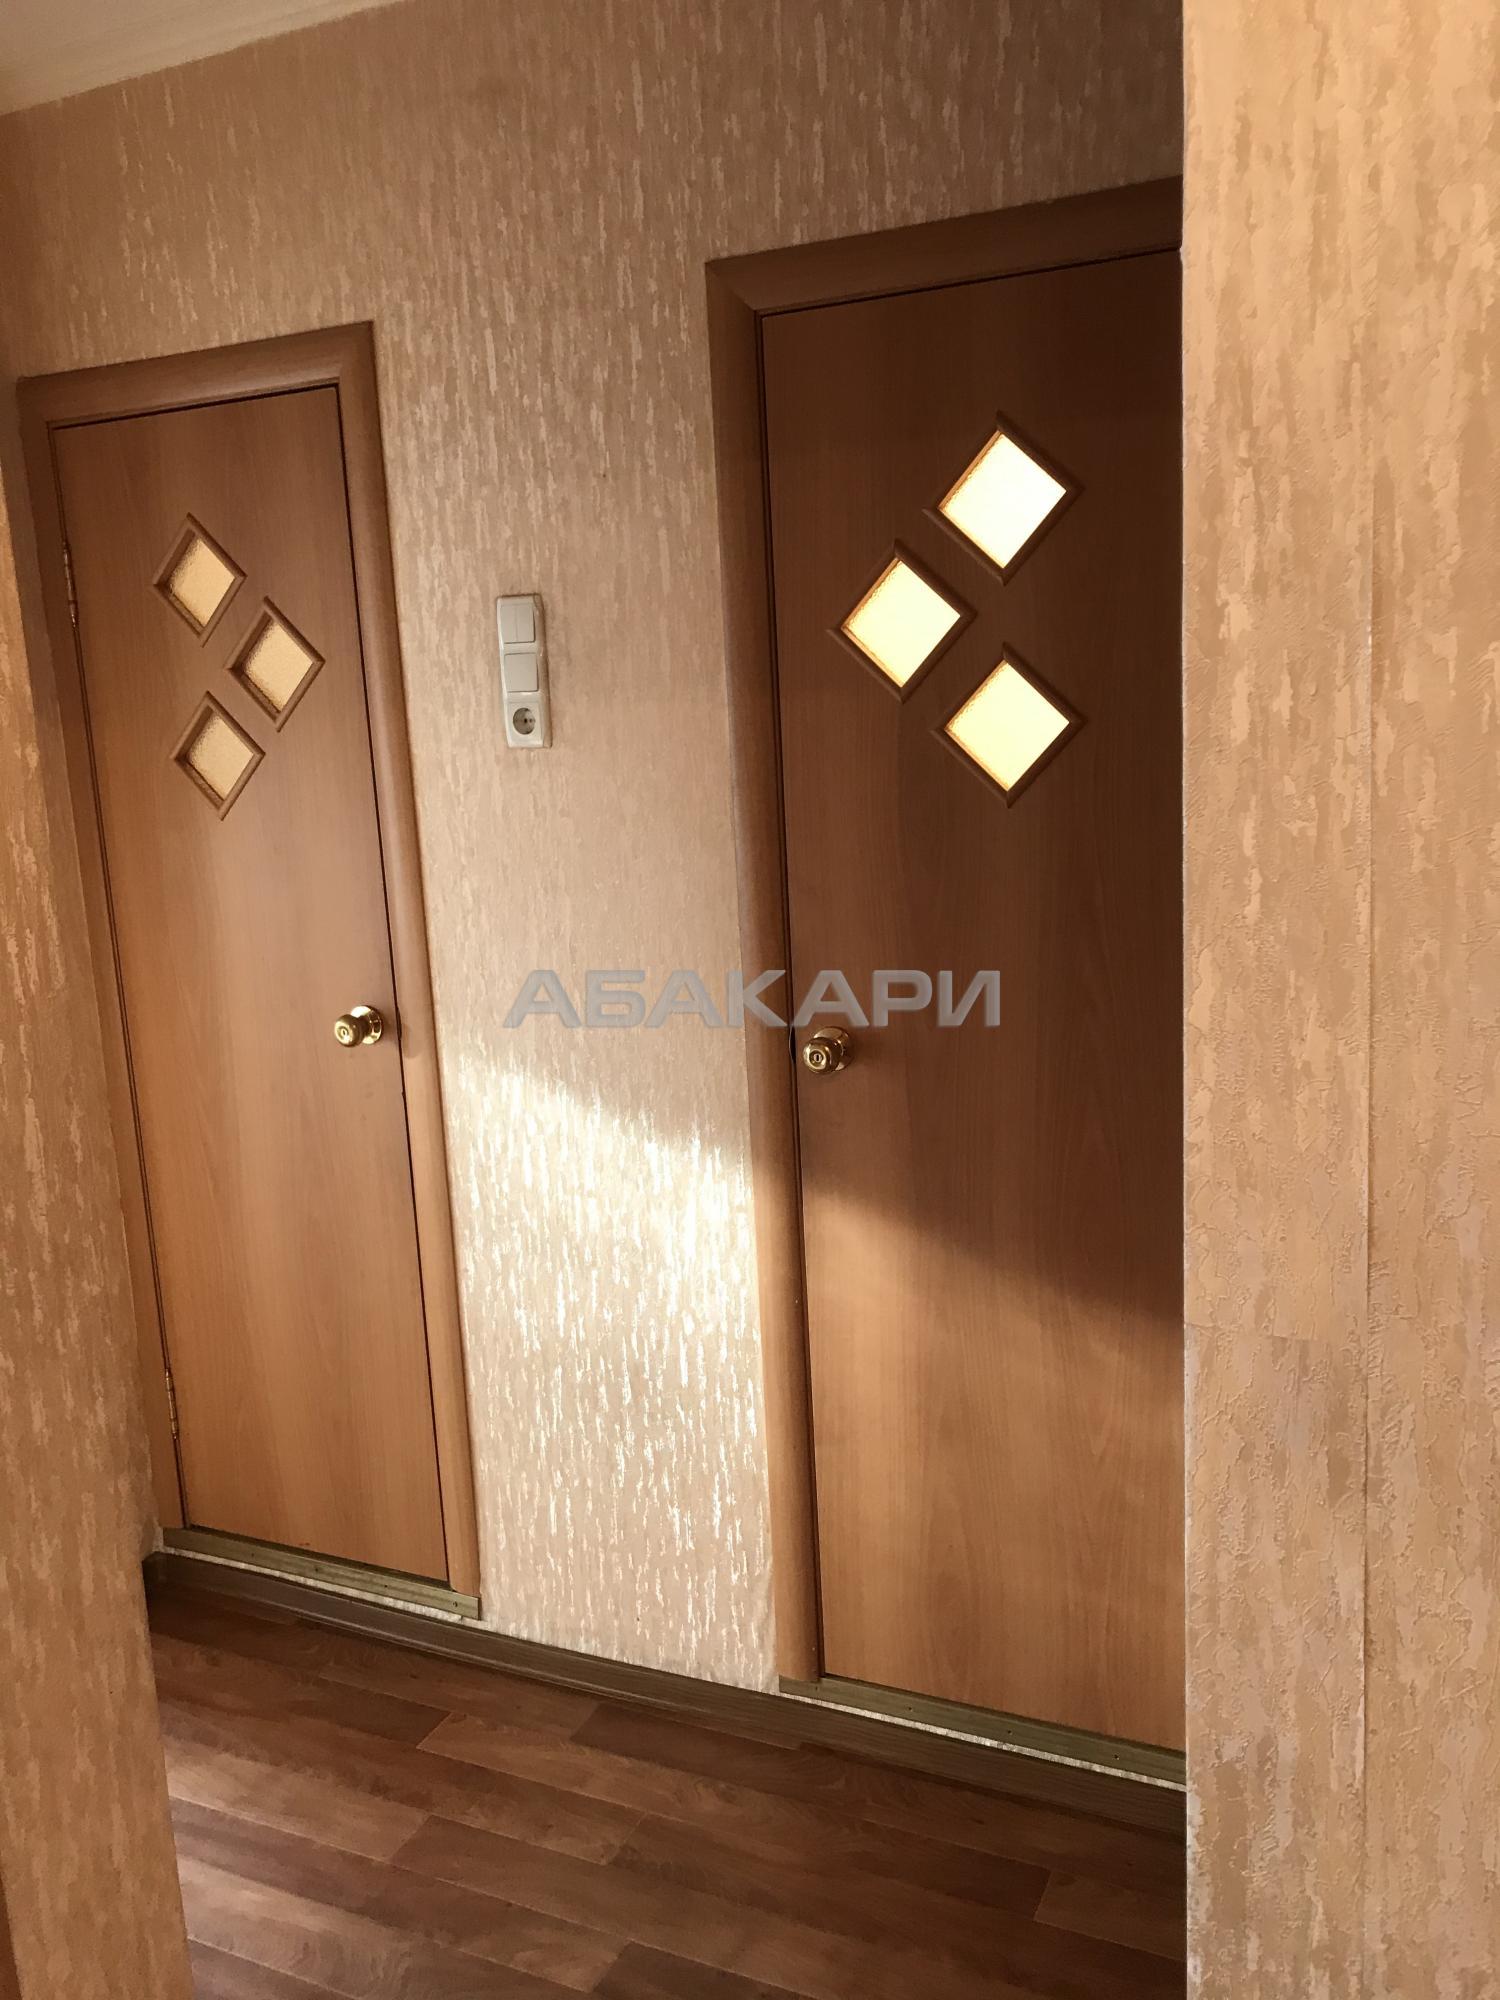 1к квартира улица Весны, 7А   18000   аренда в Красноярске фото 7